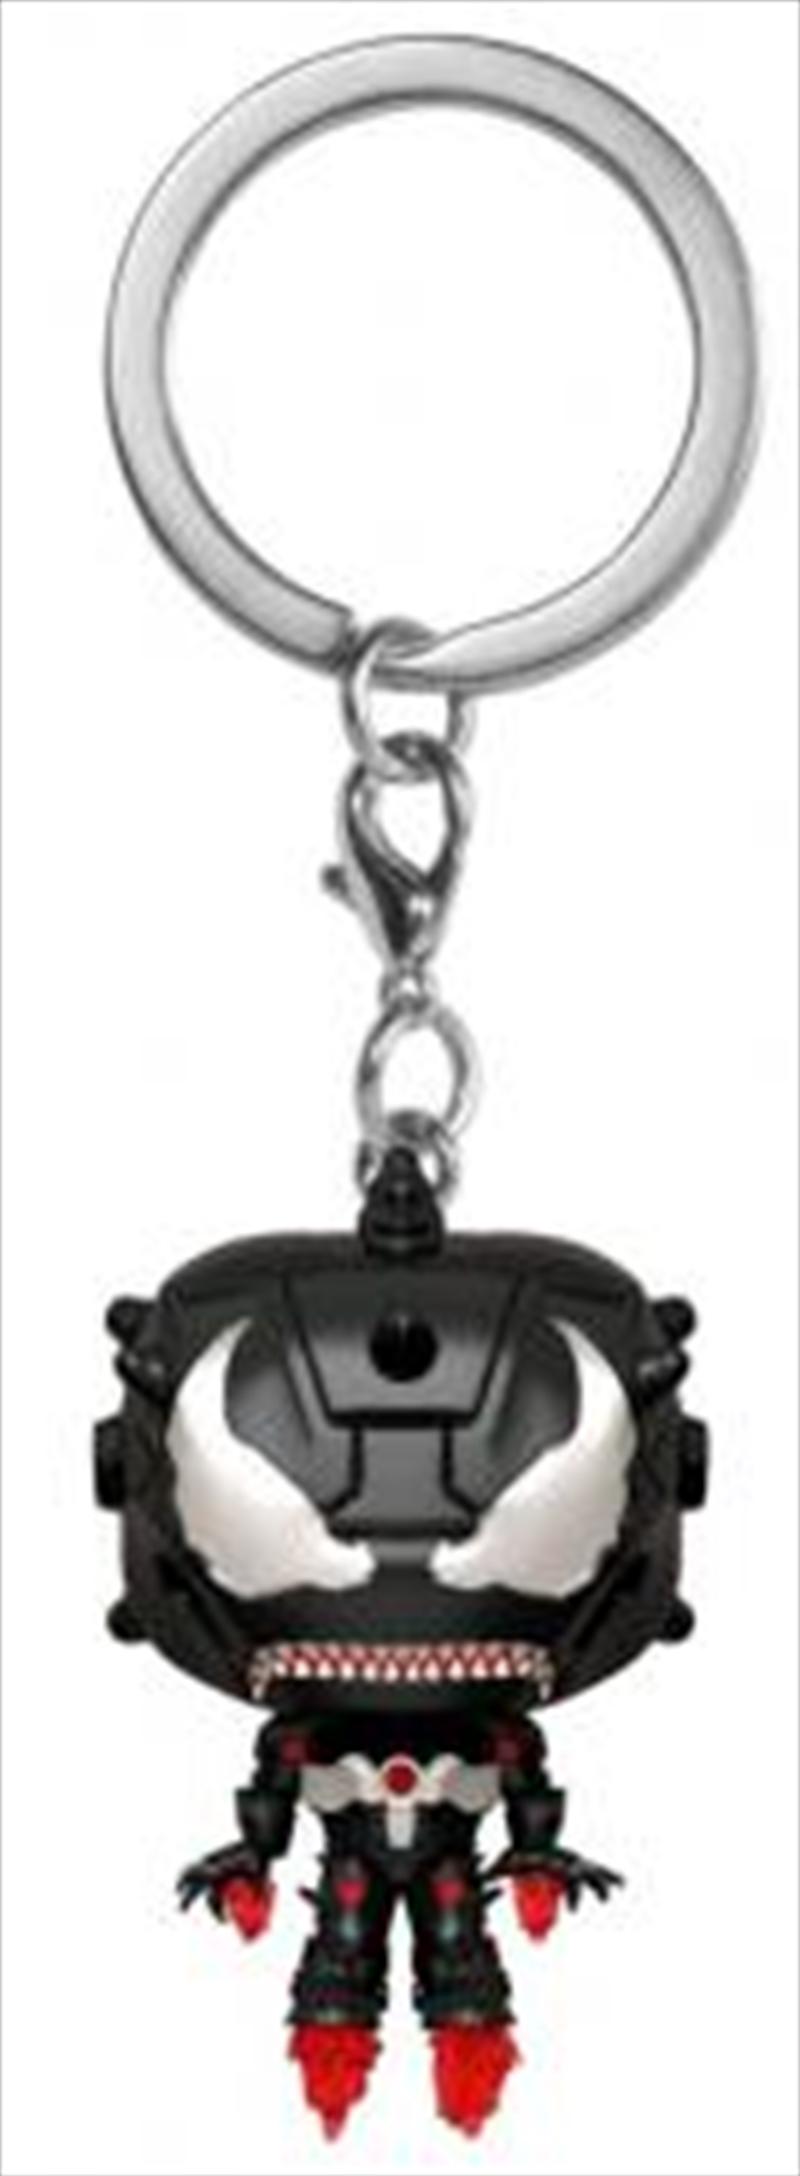 Venom - Venomized Iron Man Pocket Pop! Keychain | Pop Vinyl